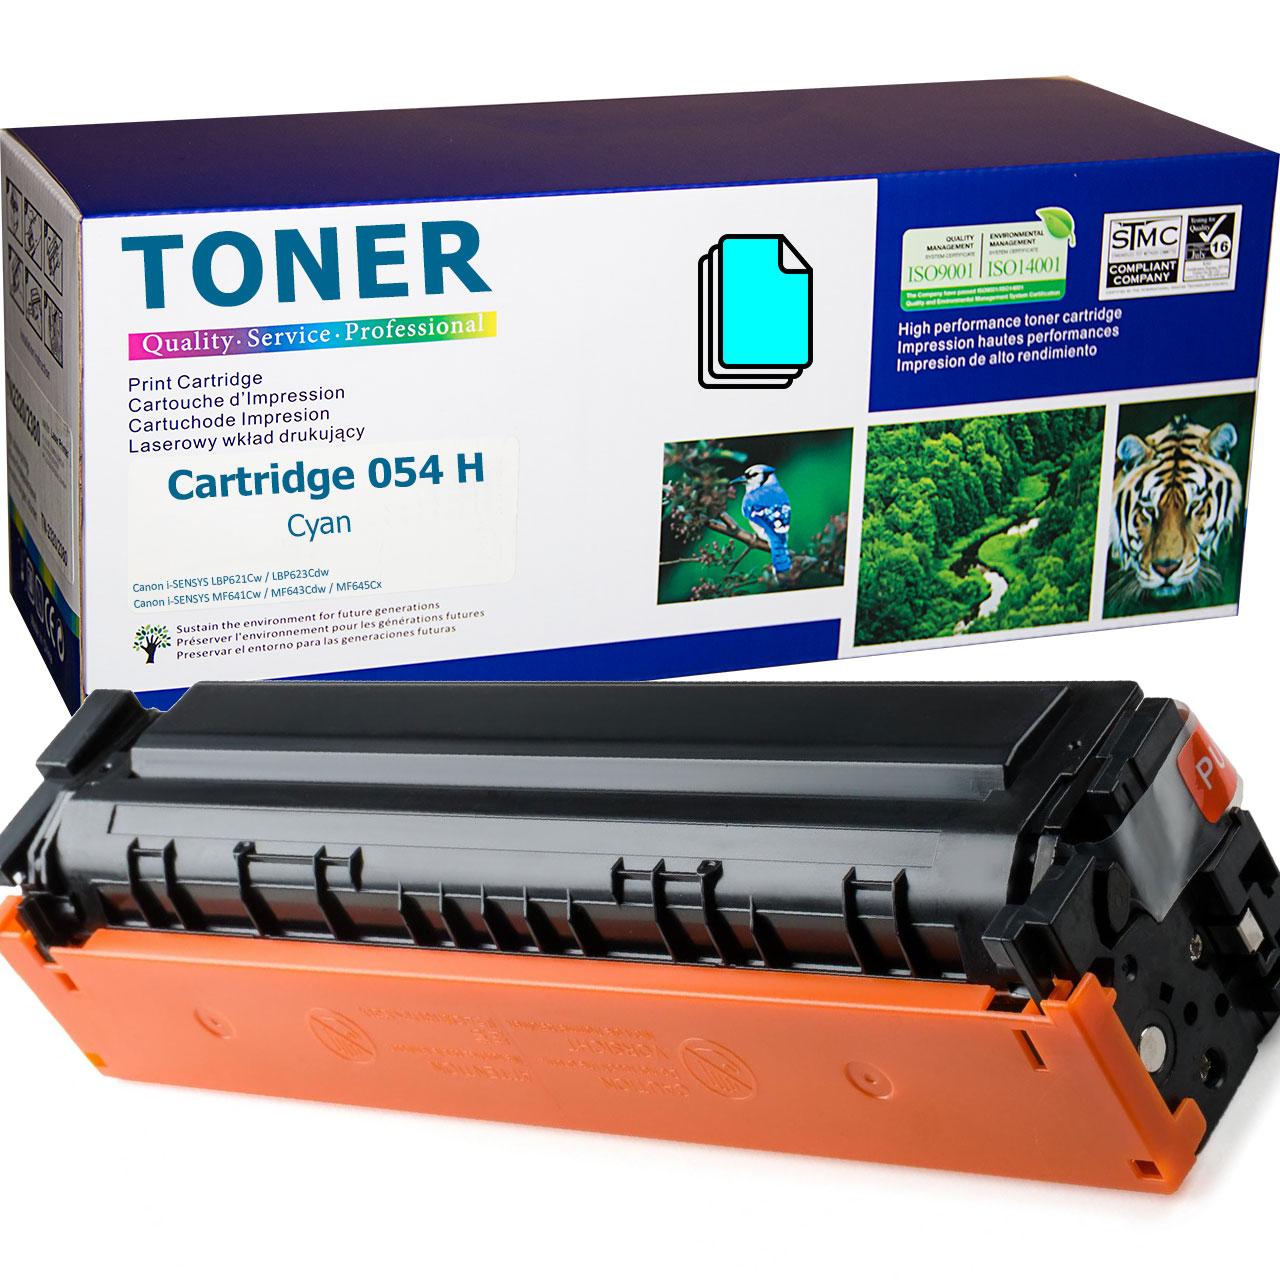 Canon Cartridge 054 H Cyan Toner Cartridge